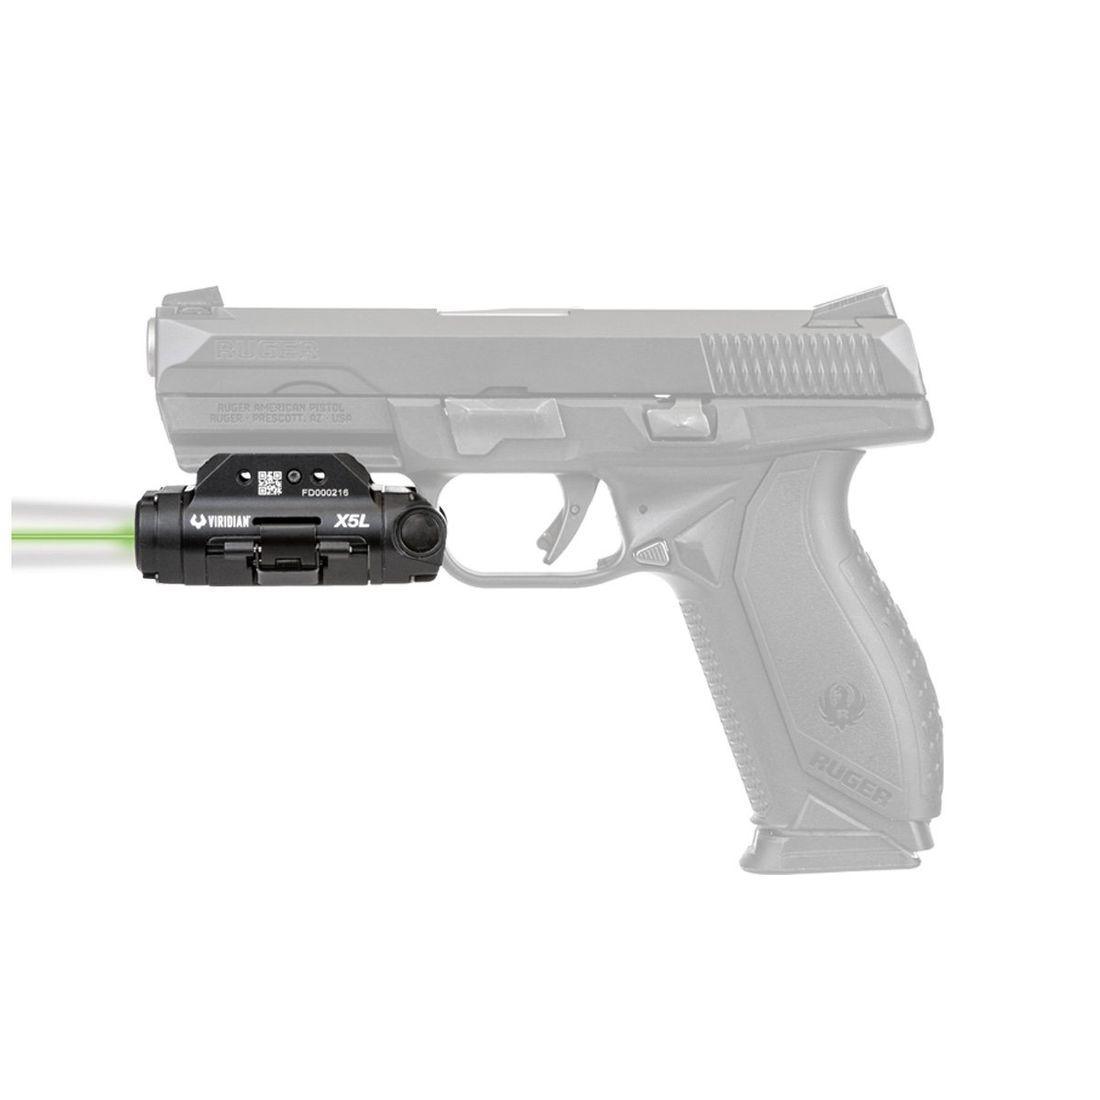 Lampe Laser Vert X5l Universel Viridian Weapon Technologies